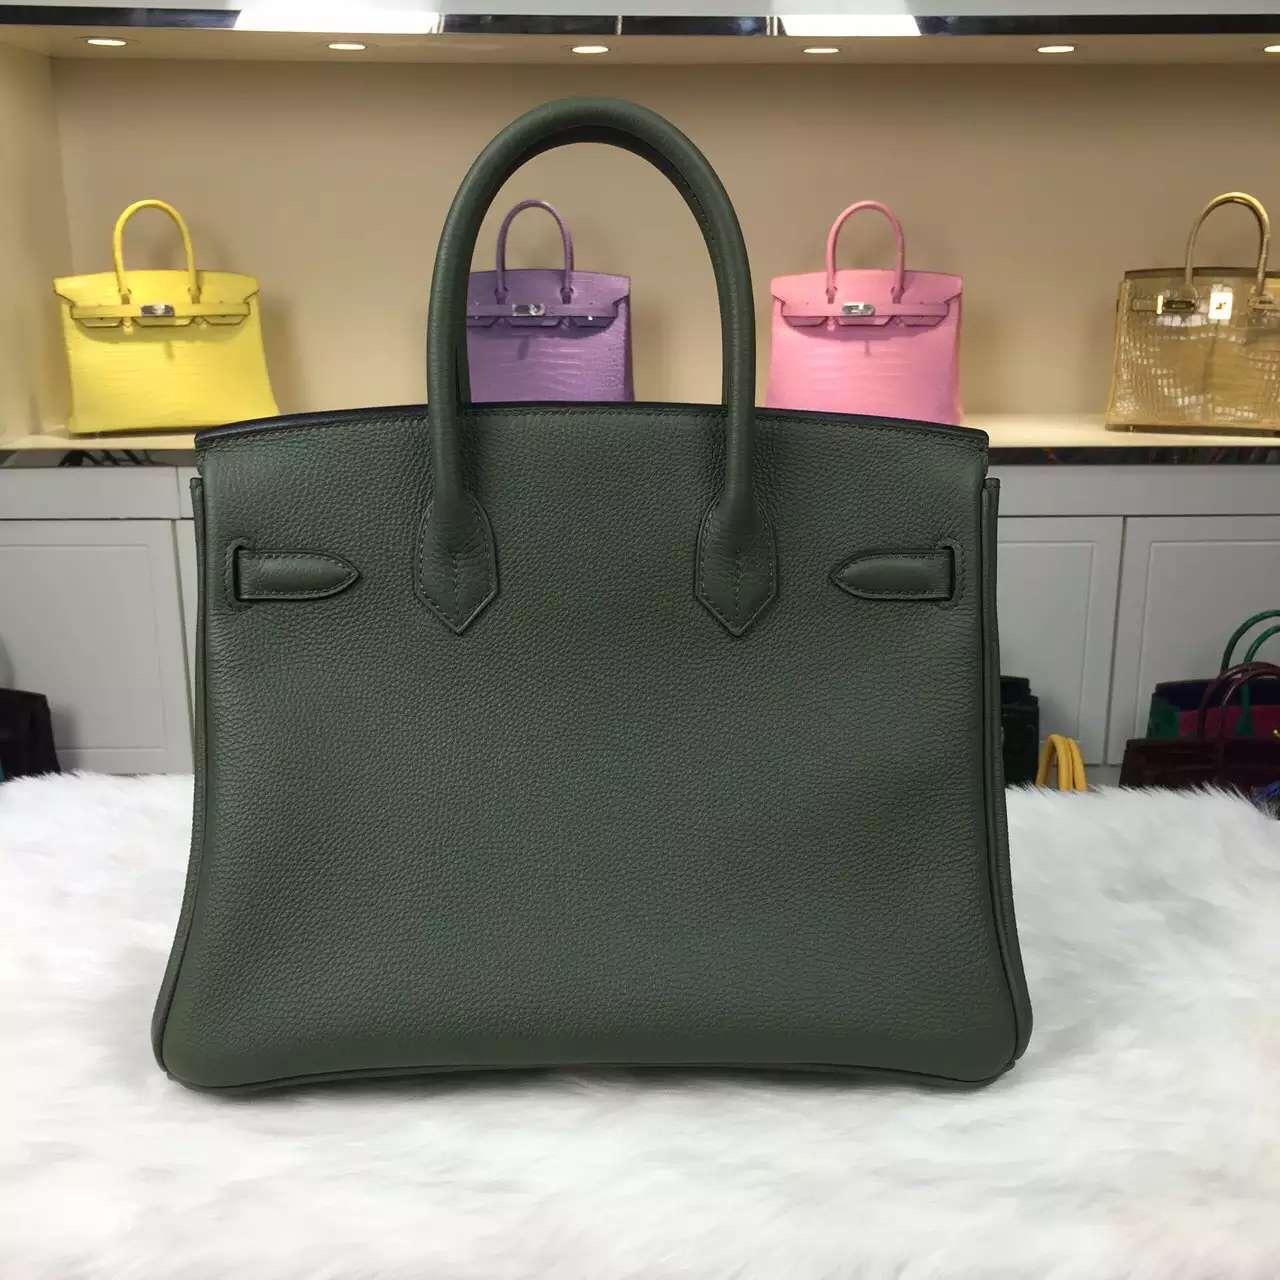 Discount Hermes V6 Canopee Green Original Togo Leather Birkin Bag 30CM